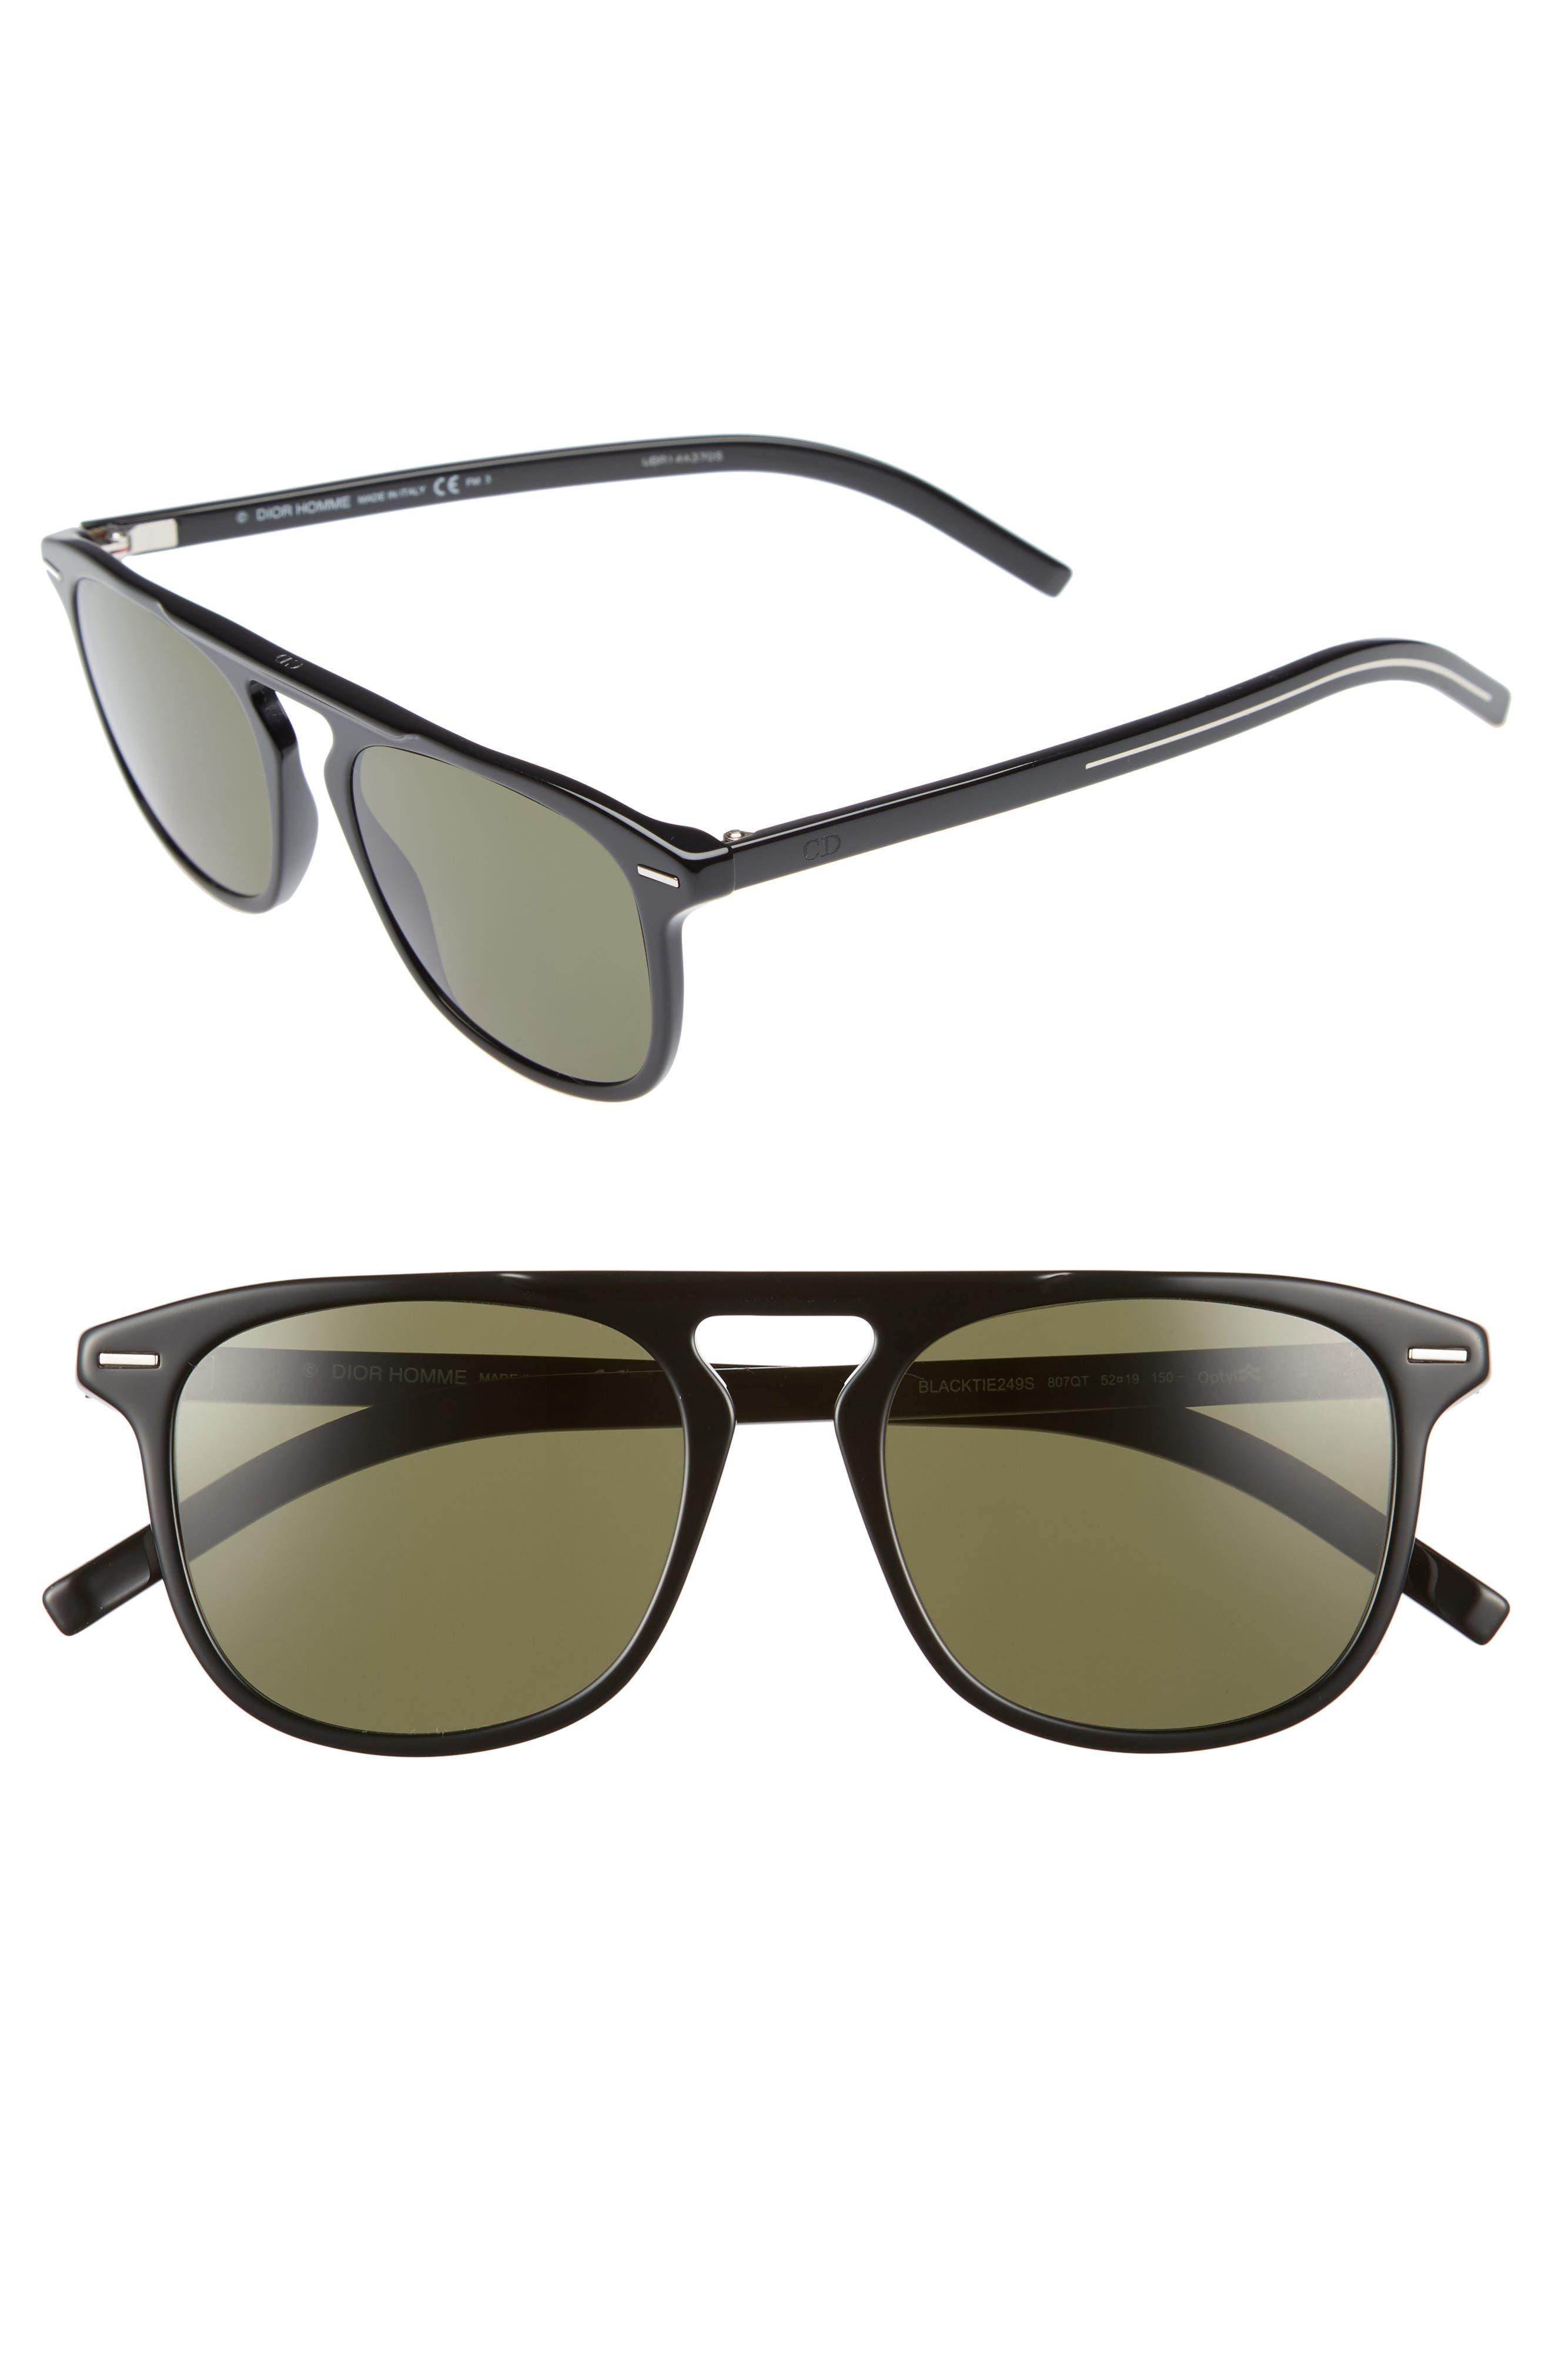 52mm Sunglasses,                             Main thumbnail 1, color,                             001